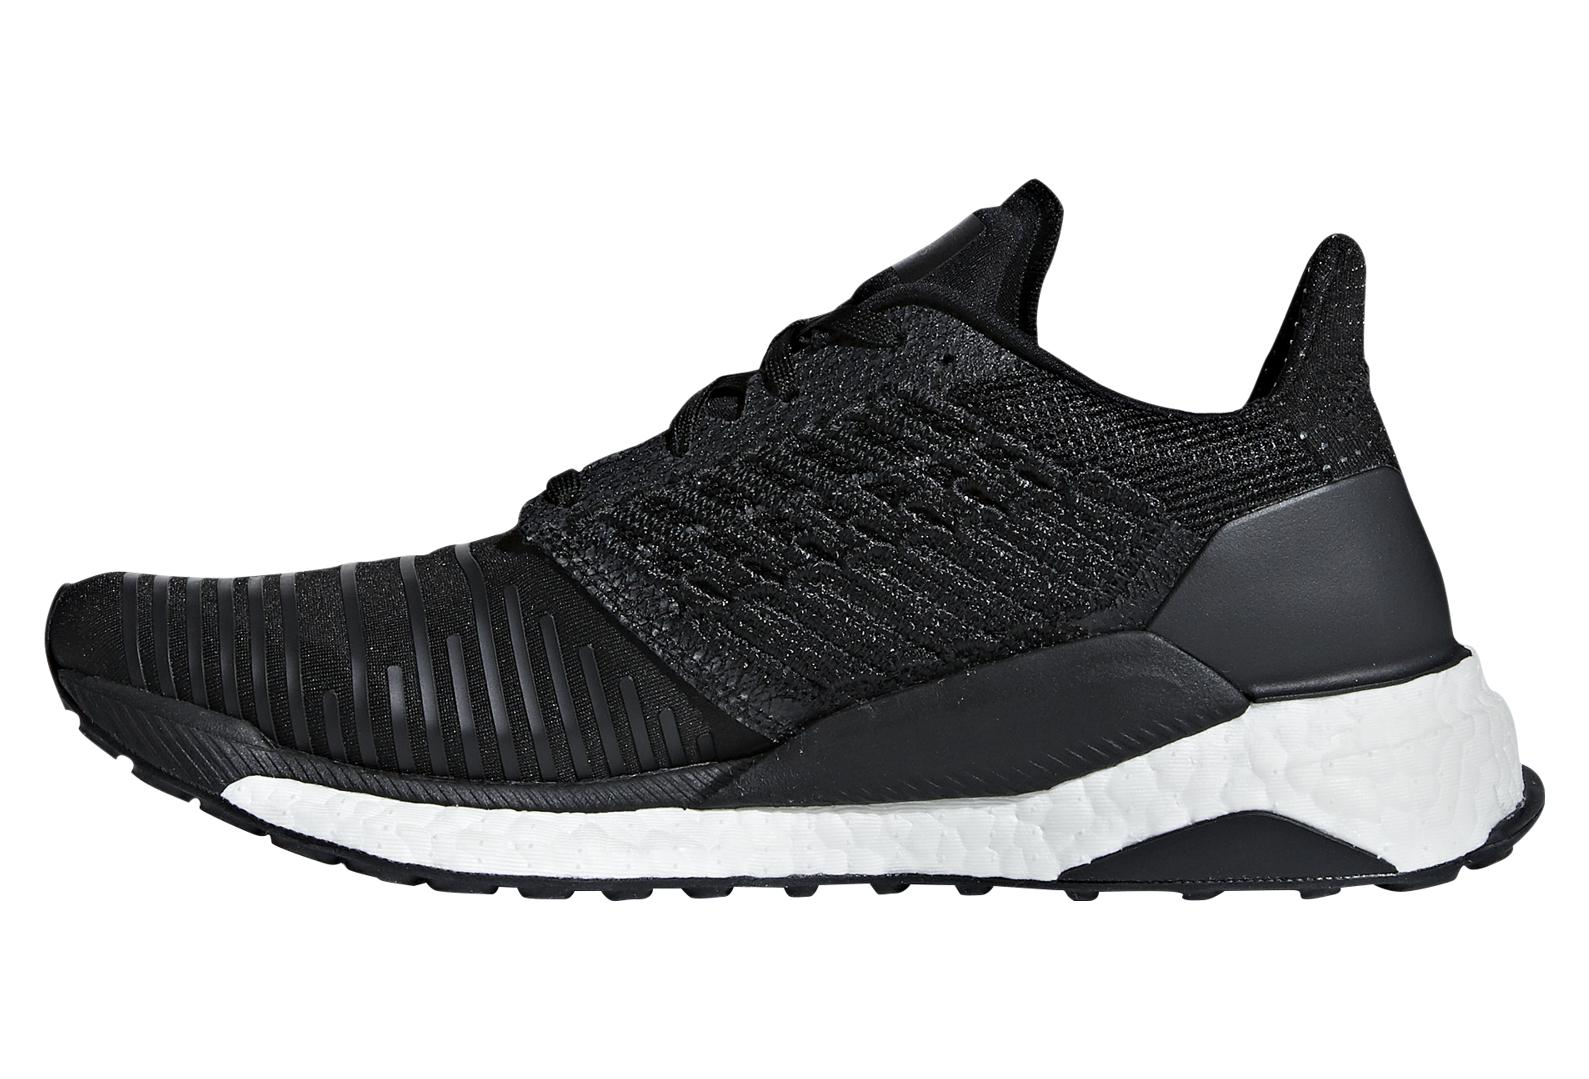 sale retailer 6c6e9 cdbd2 Adidas SOLAR BOOST Women's Shoes Black